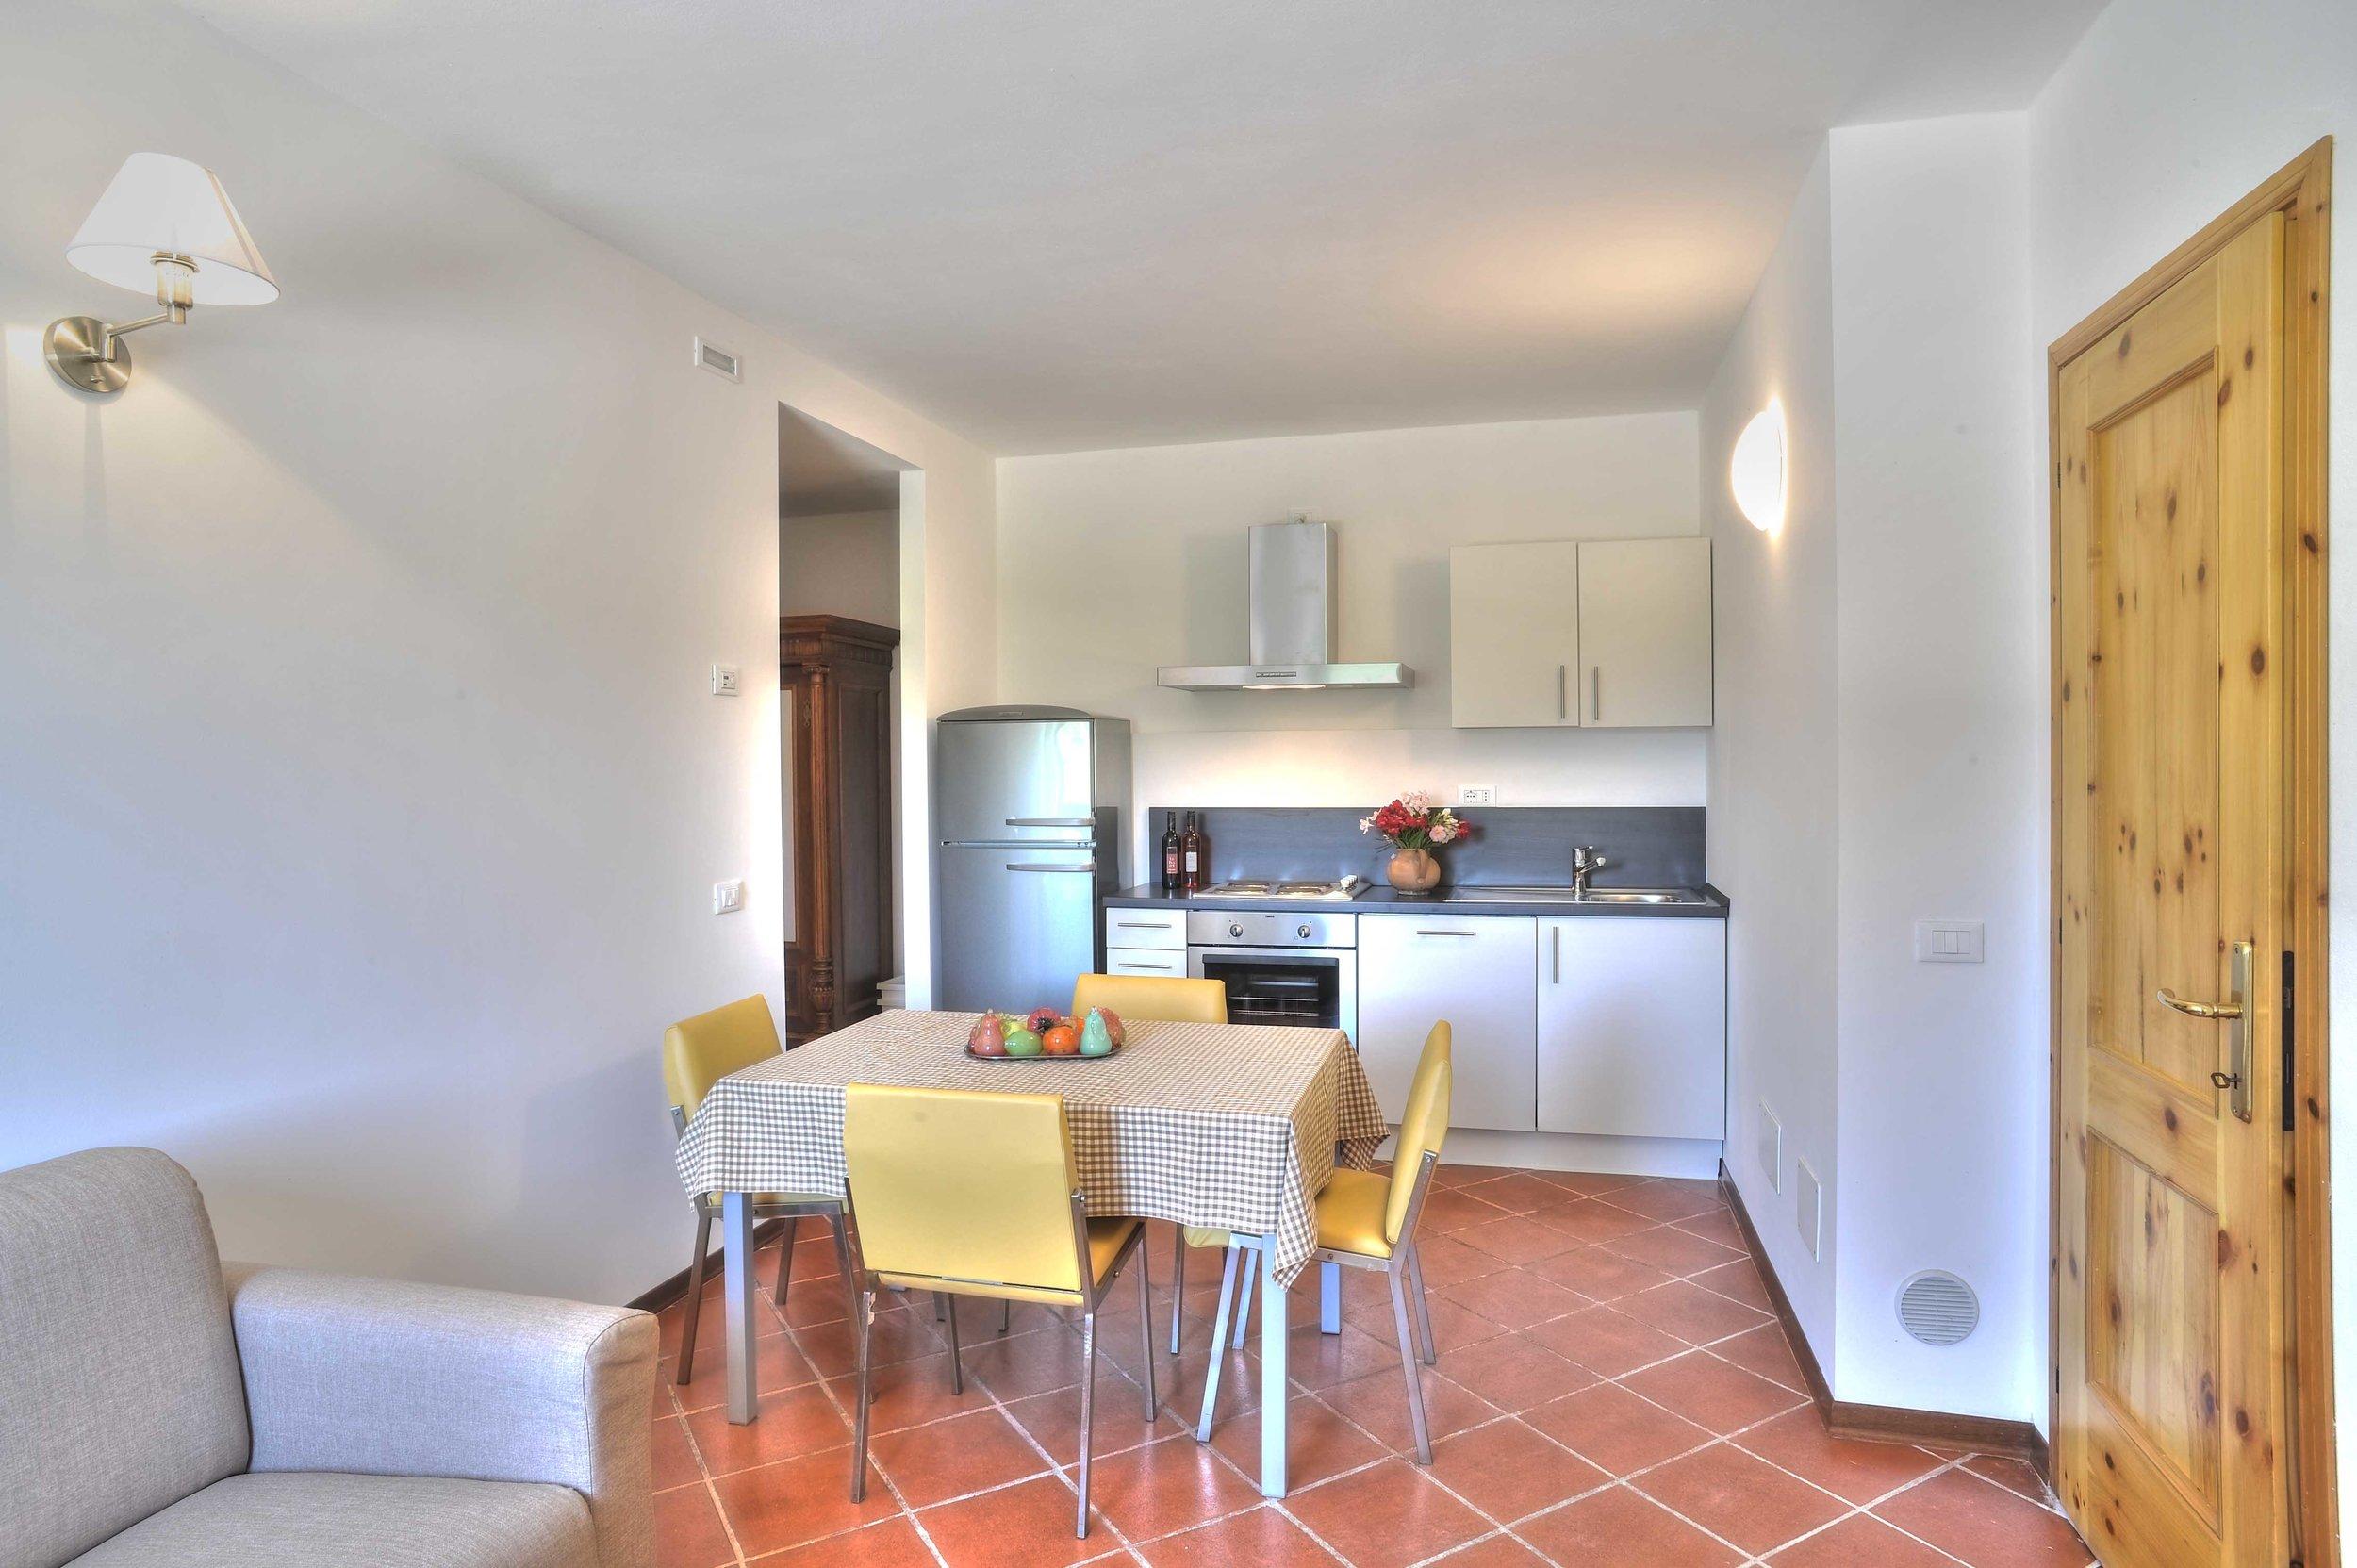 cucina rondinella.jpg